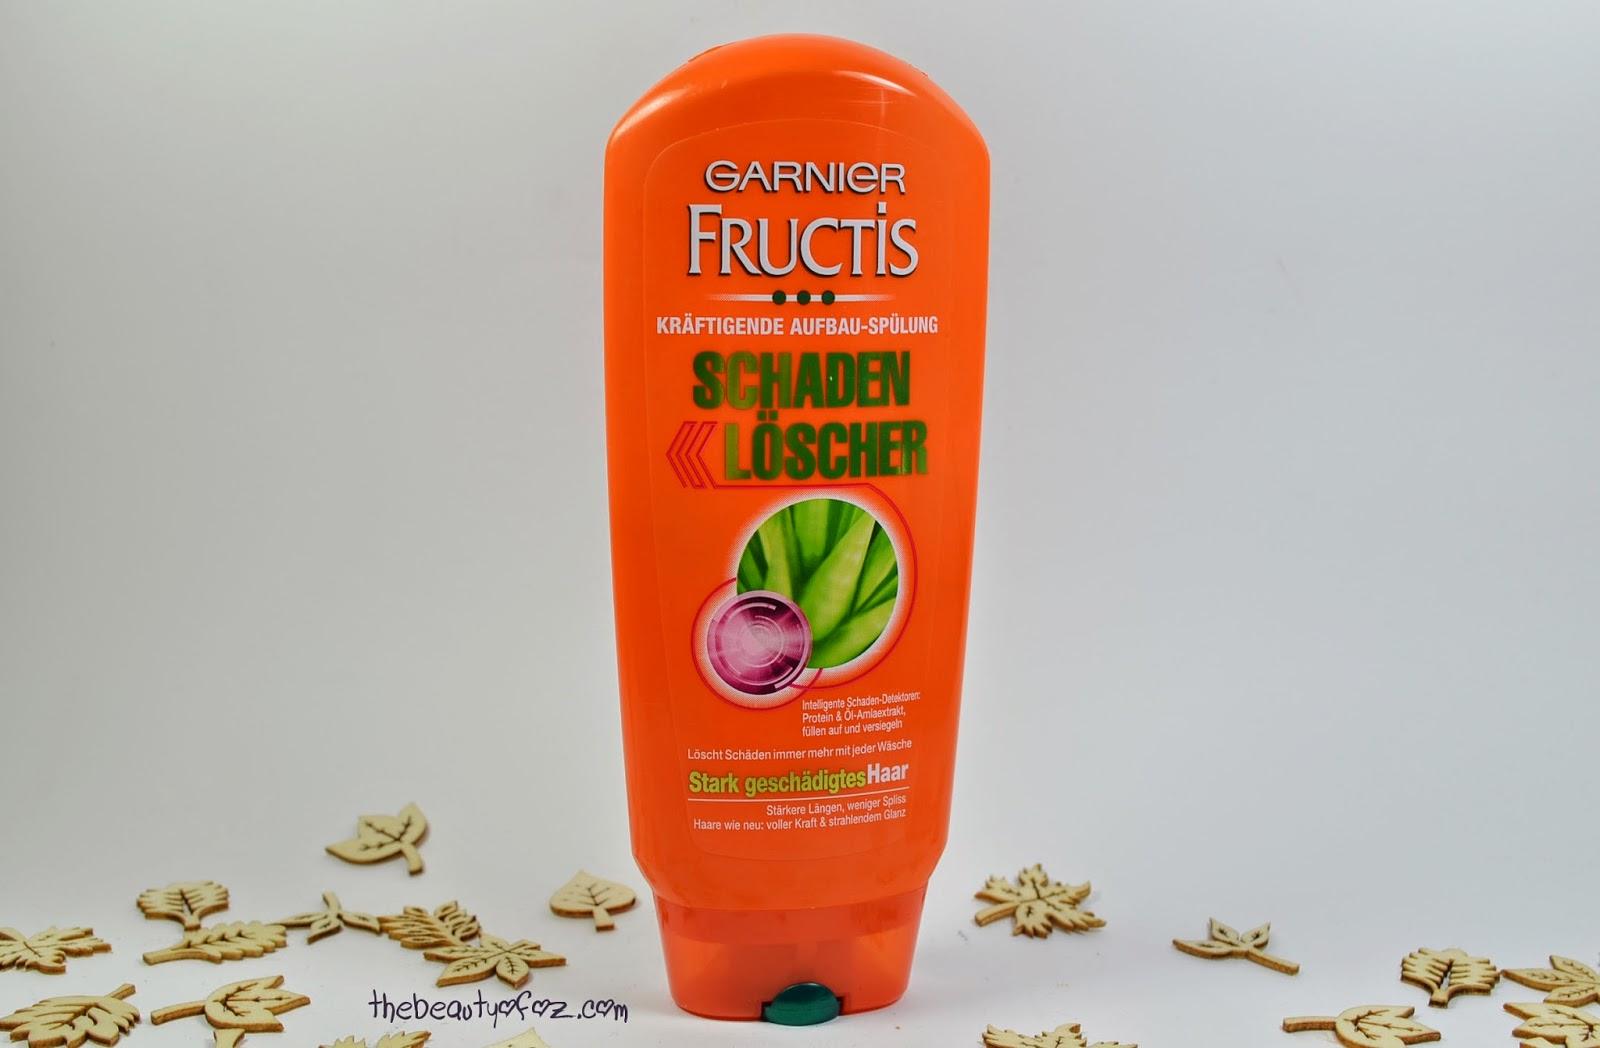 Garnier Fructis Aufbau-Spülung Schaden Löscher